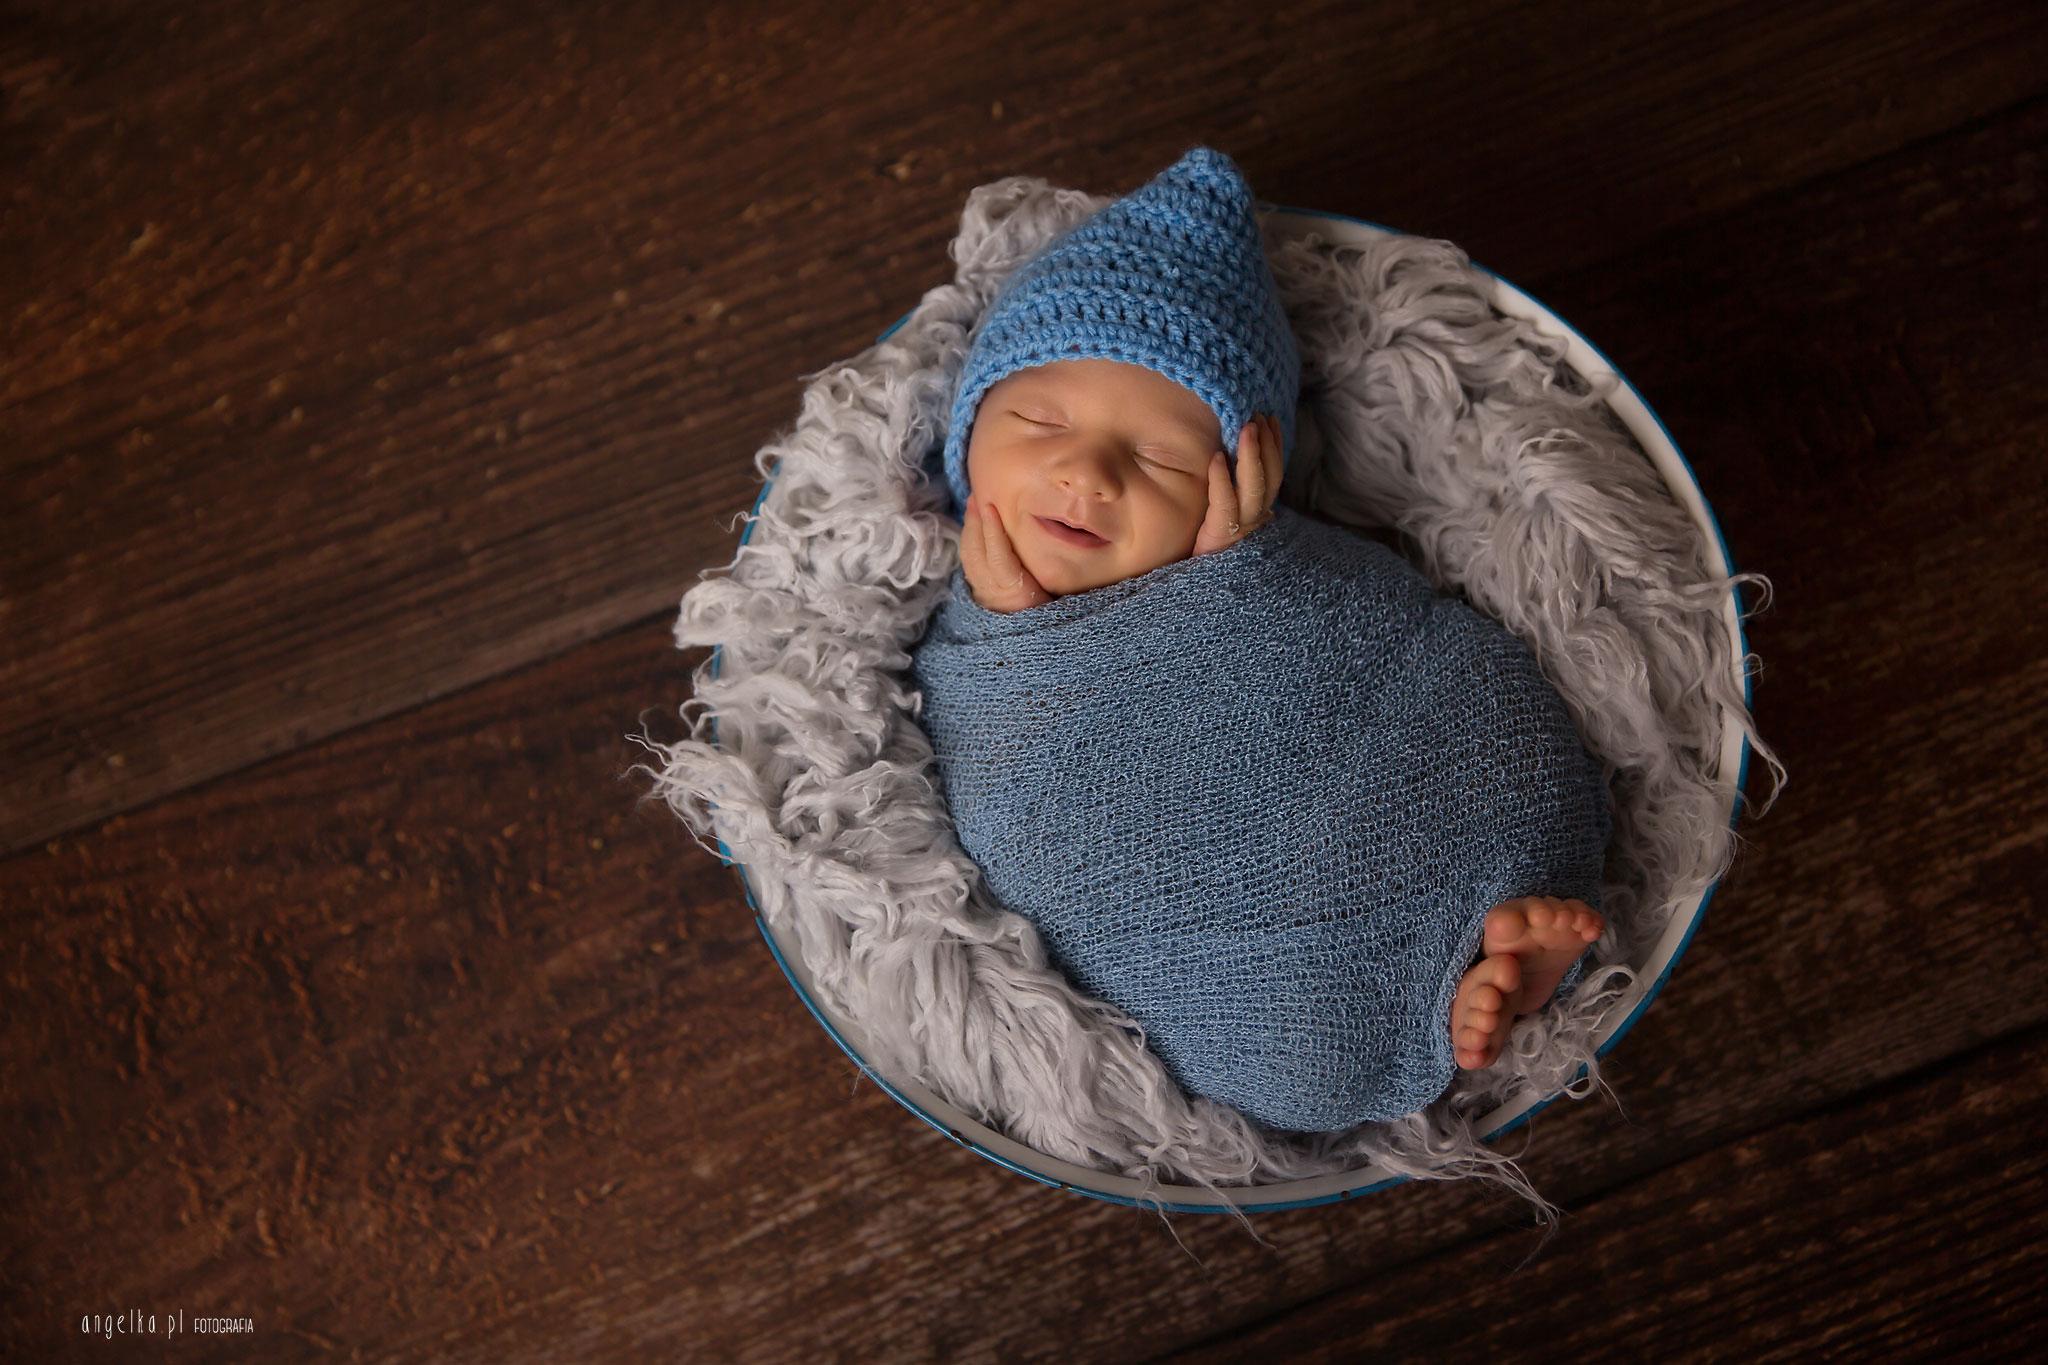 sesja noworodkowa warszawa